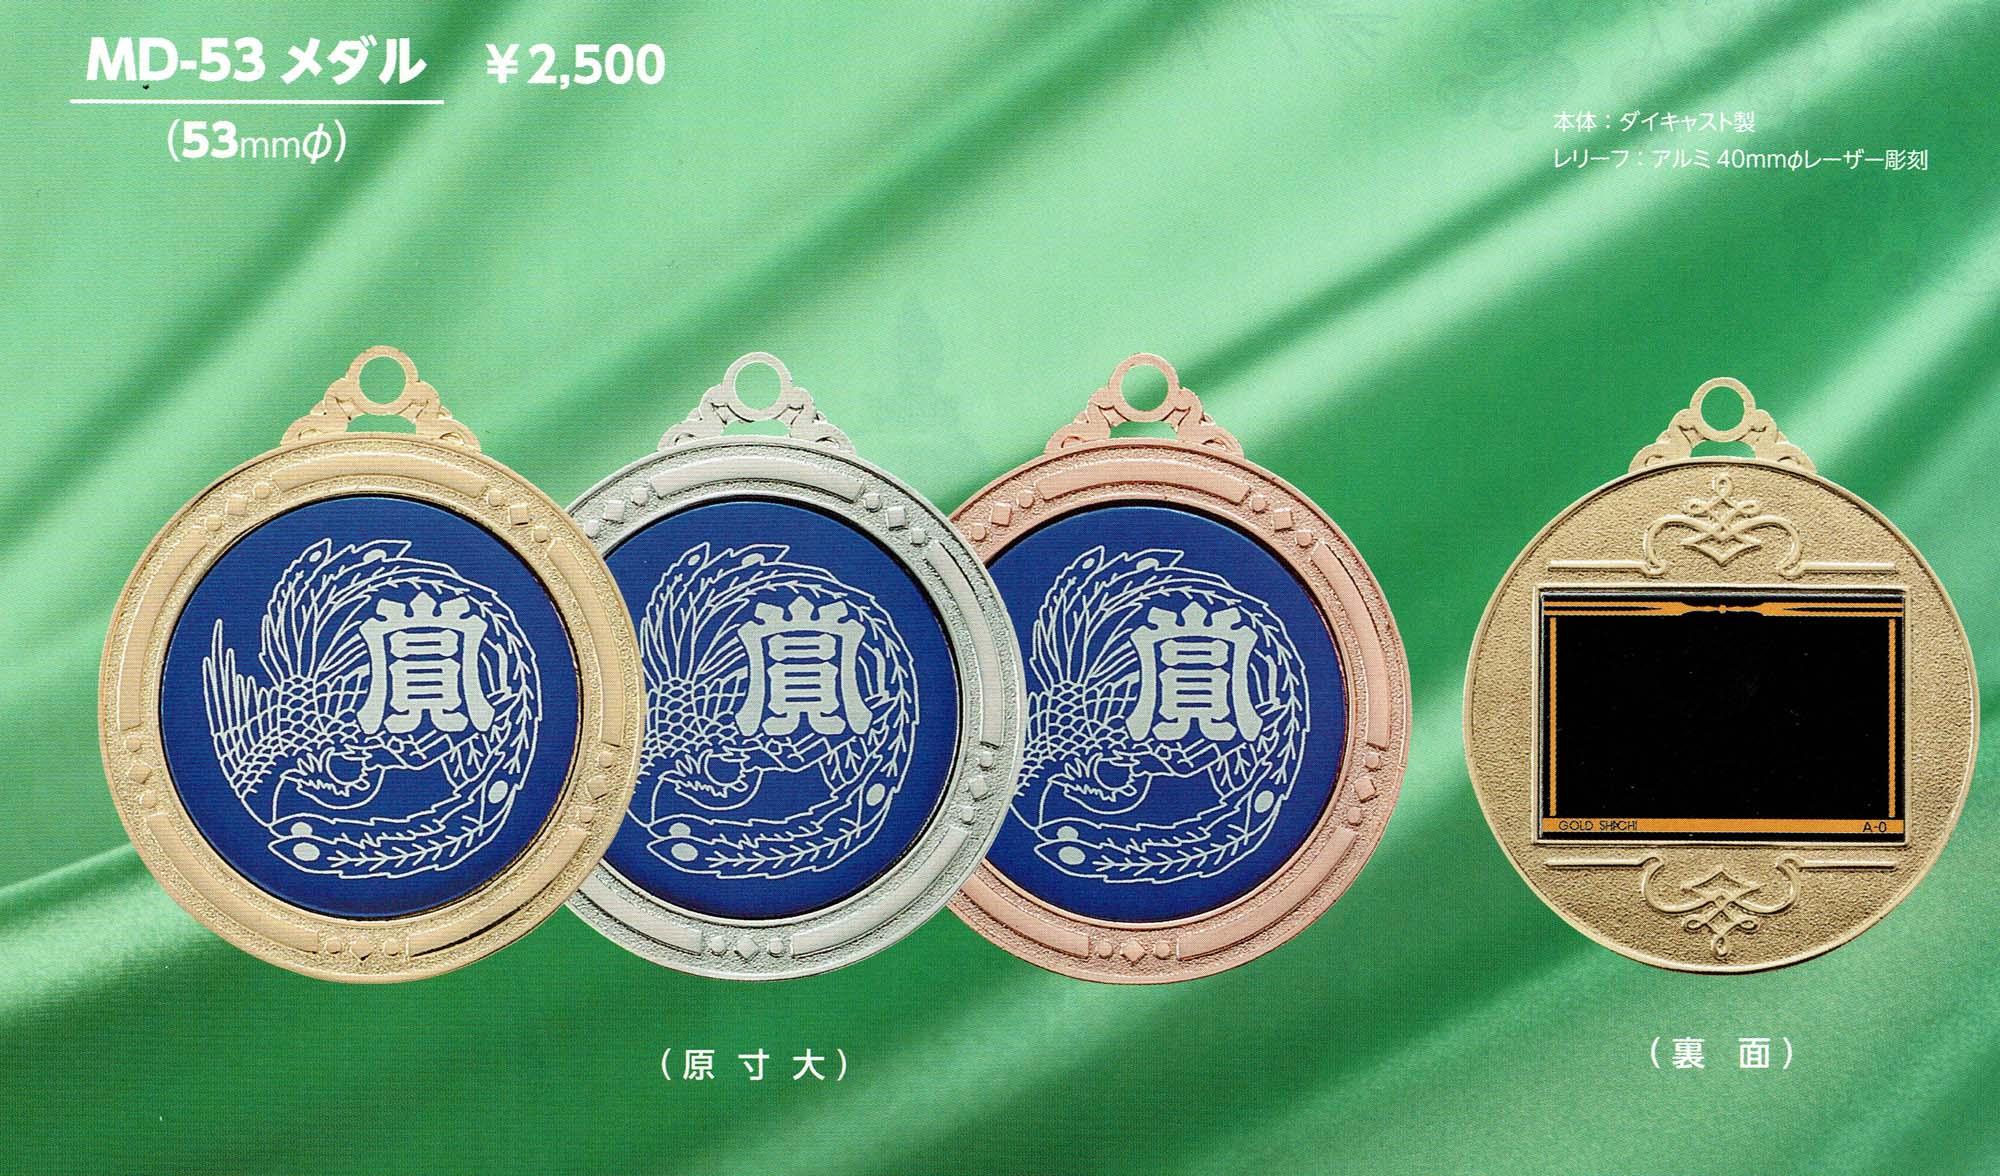 MD-53メダル